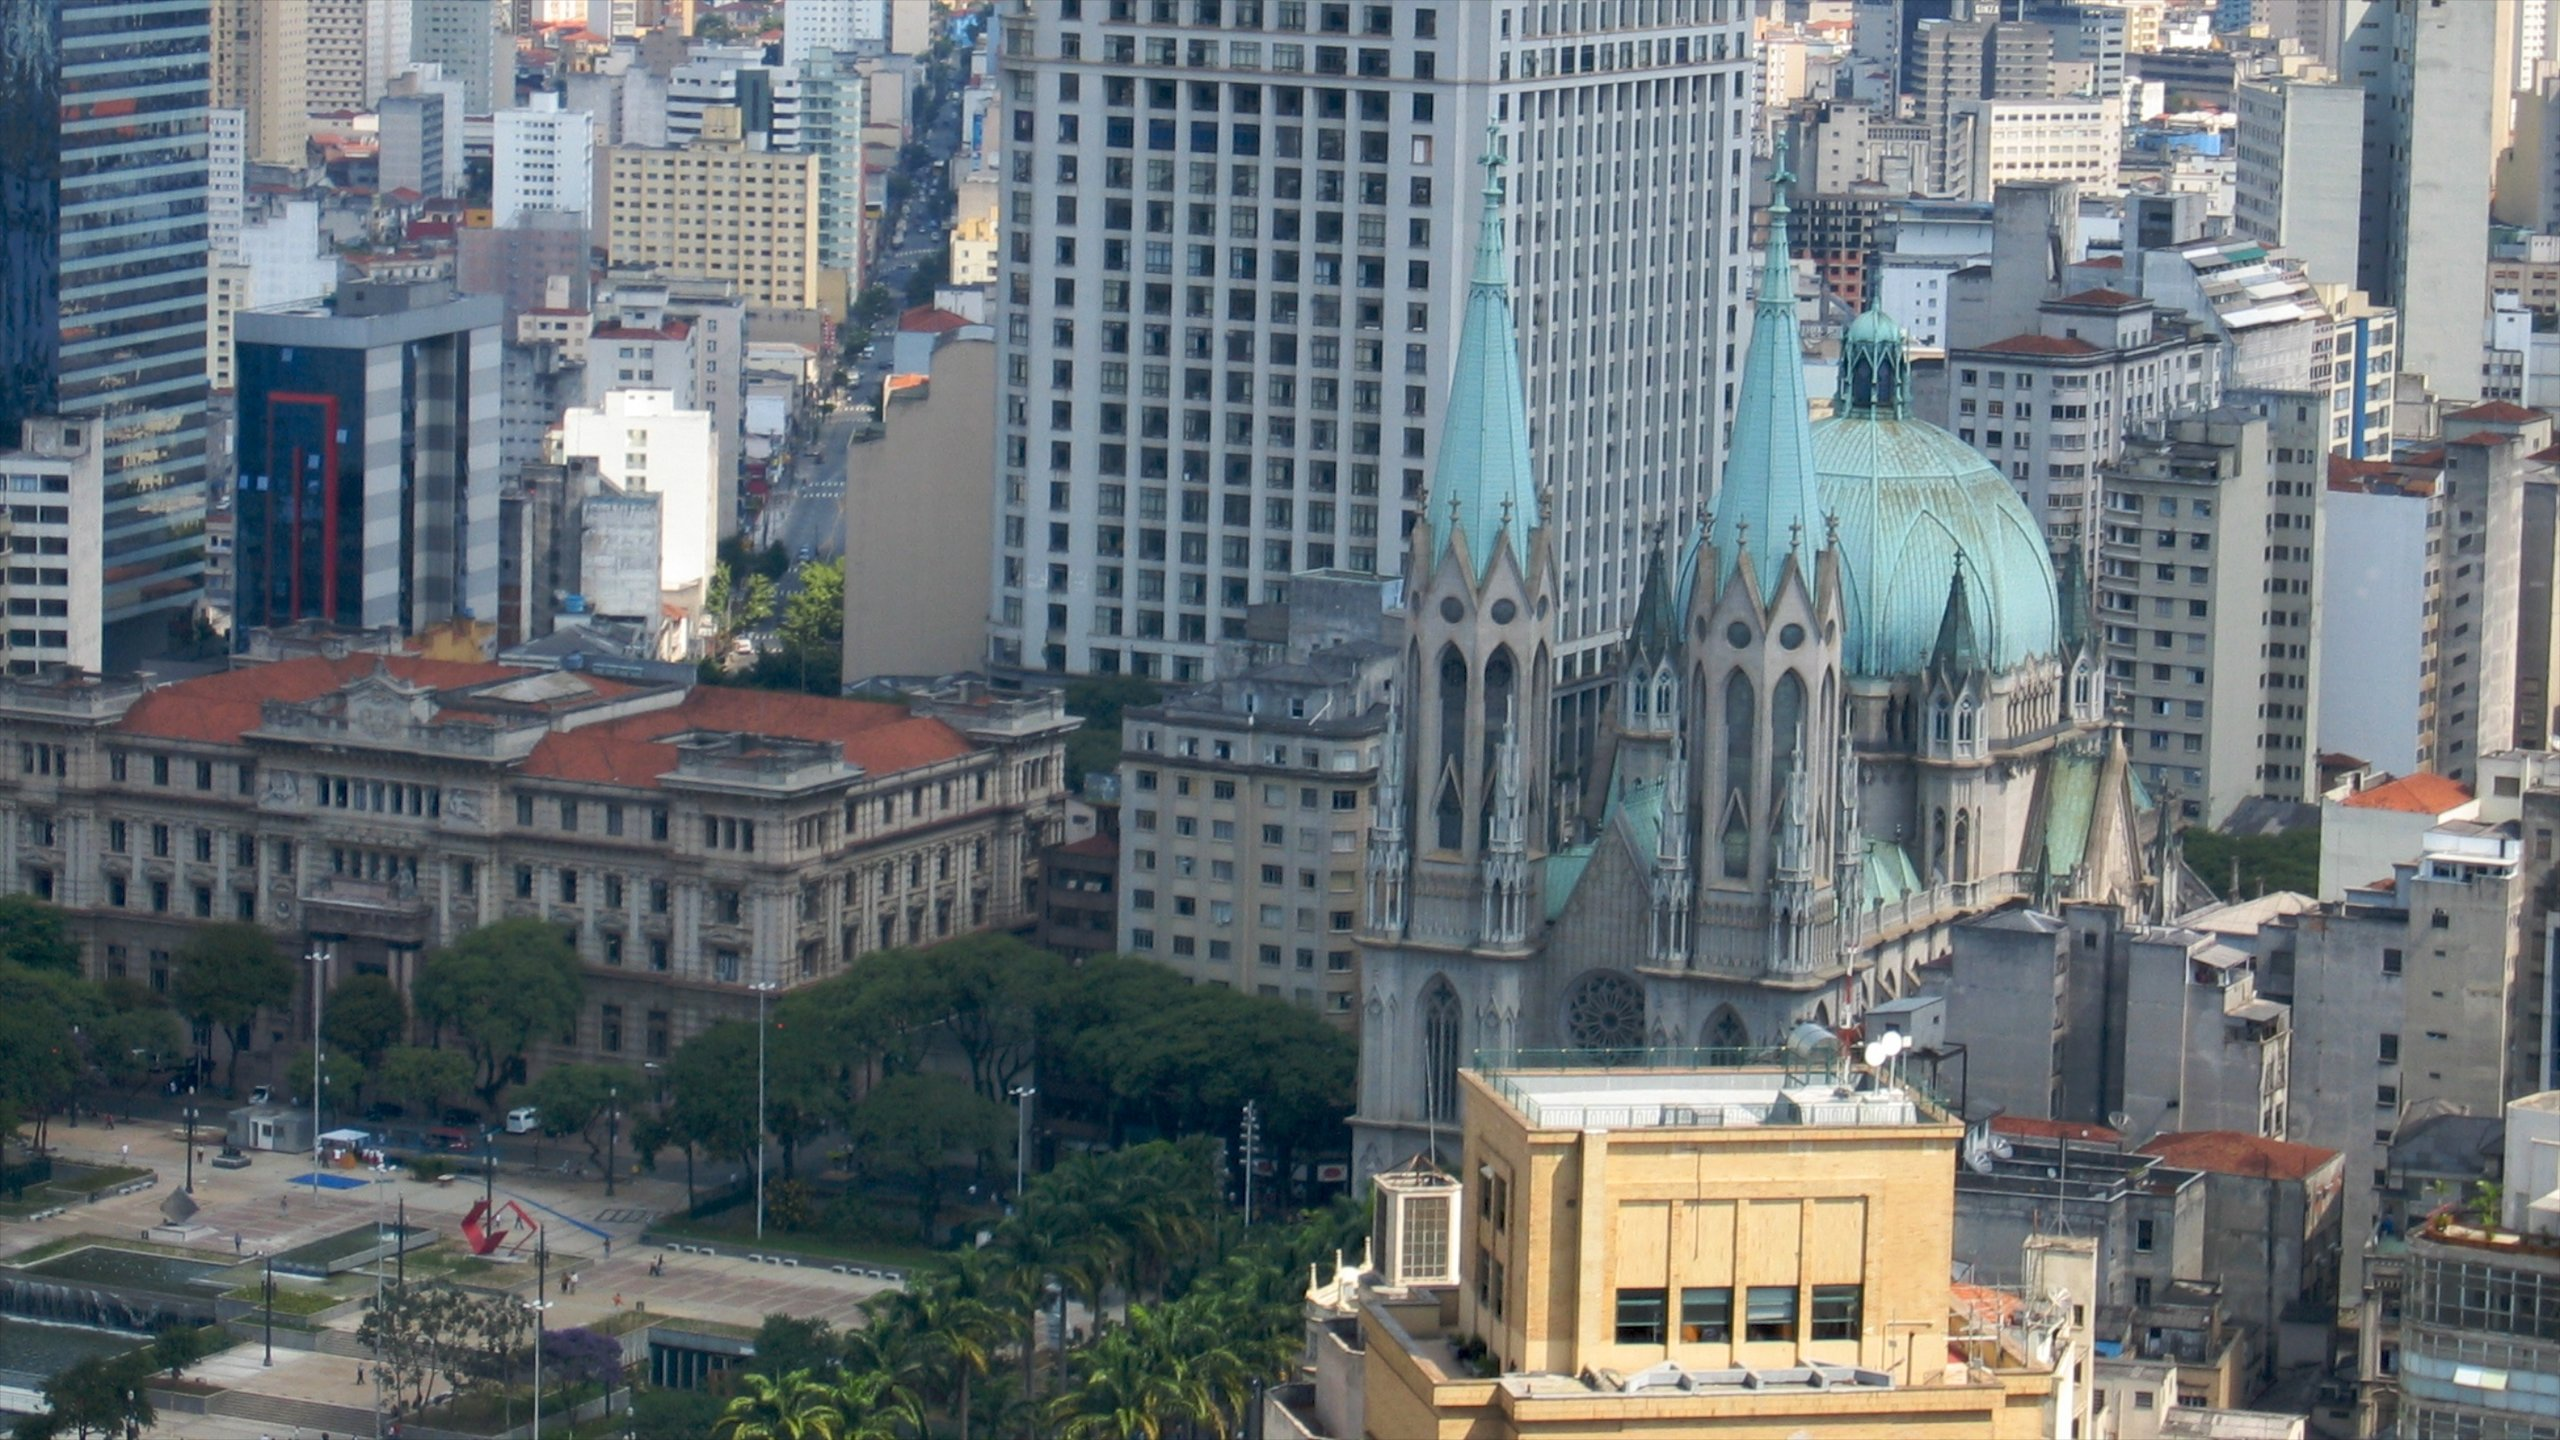 Sao Paulo, Sao Paulo State, Brazil